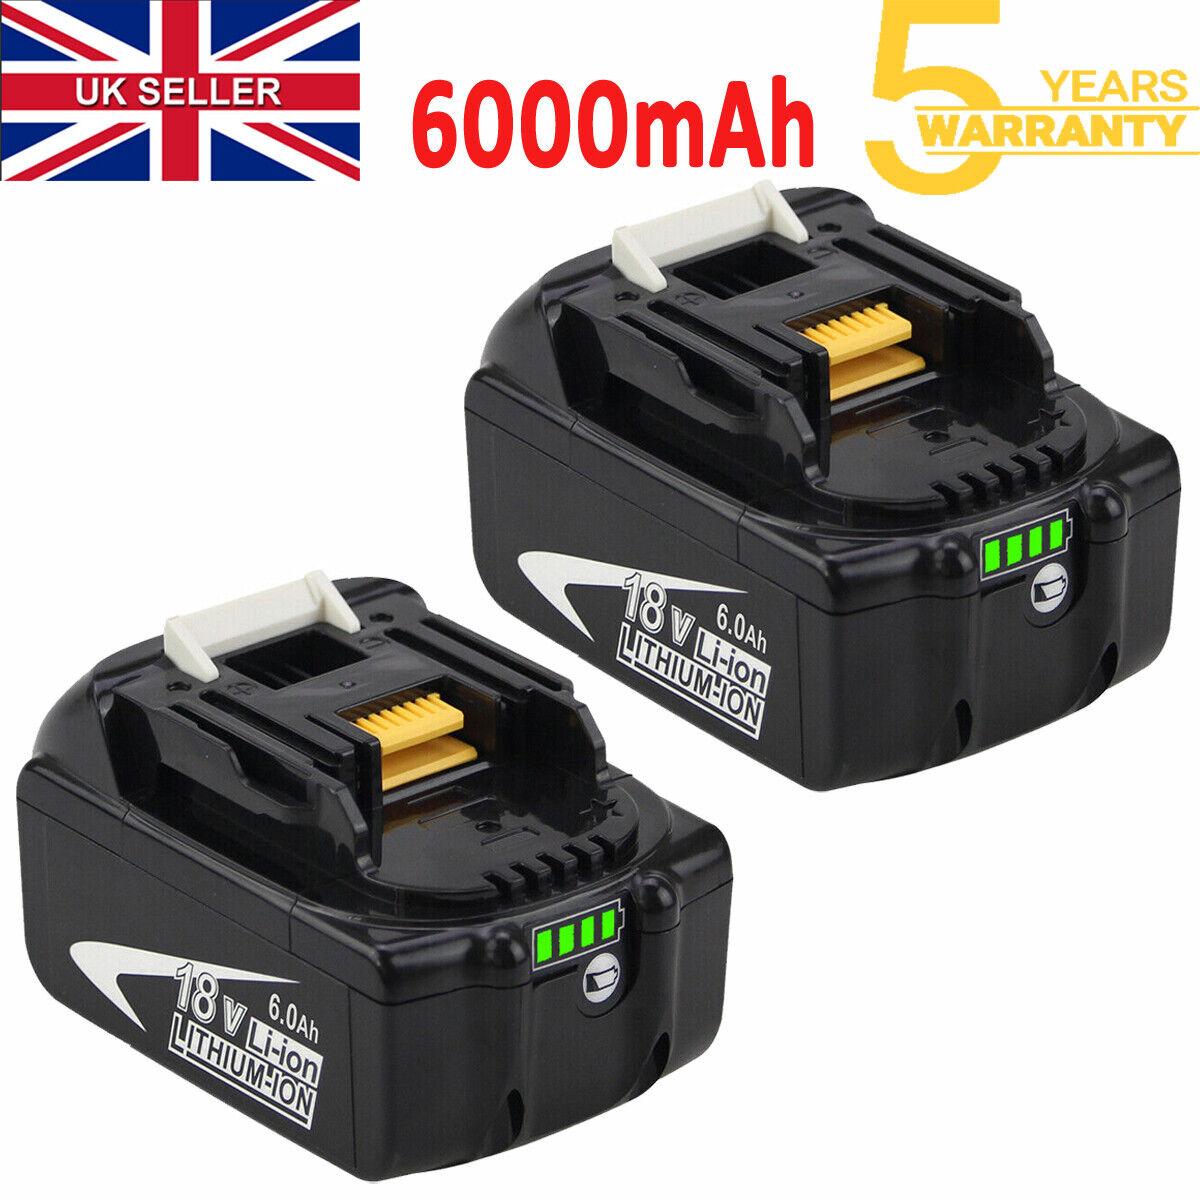 2x for Makita 18V Battery 6.0Ah BL1830 BL1840 BL1850 BL1860 LXT LED Indicator